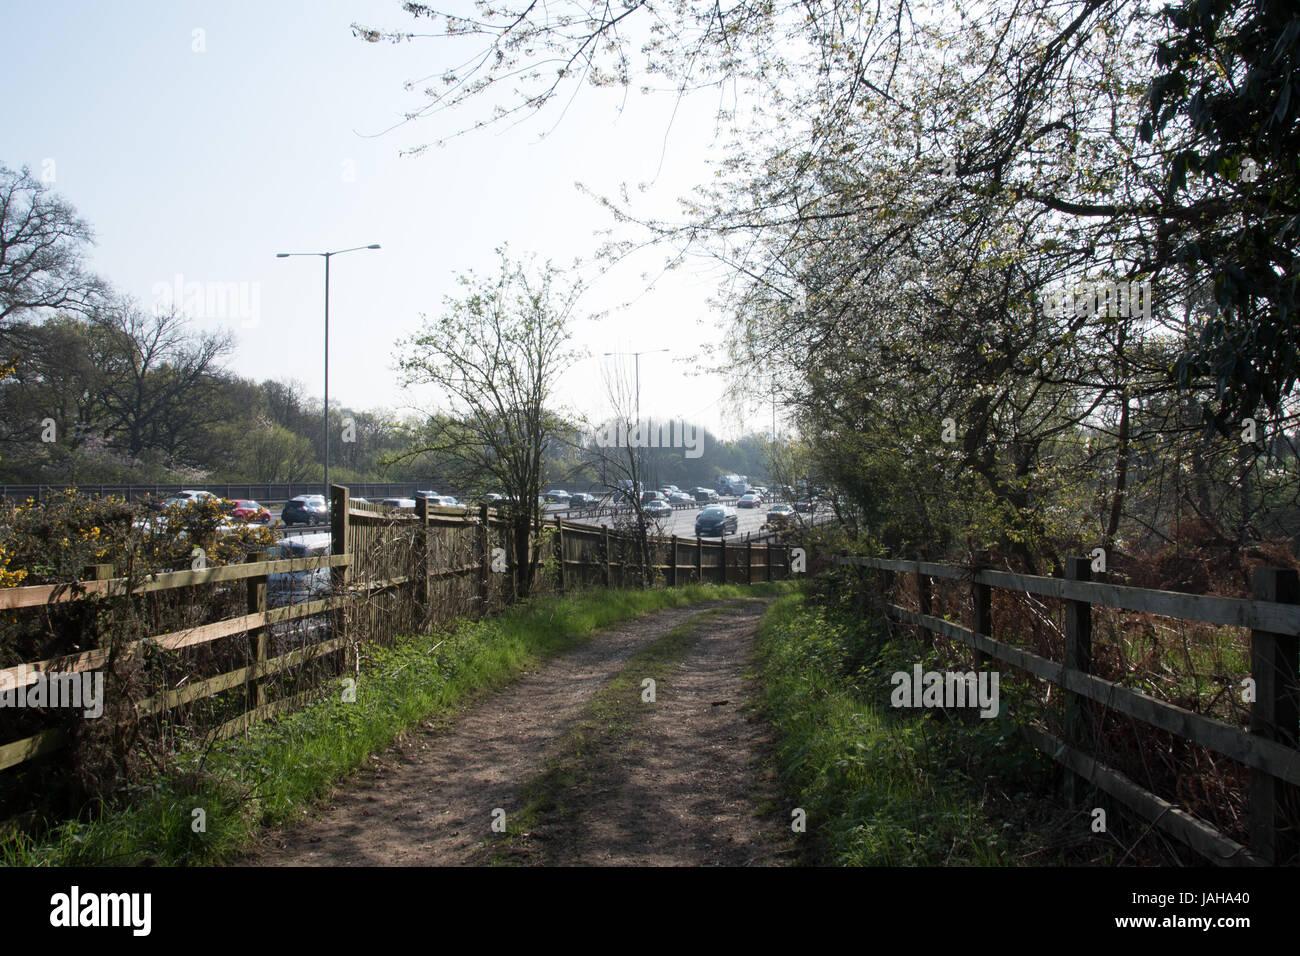 Farm track alongside the London's Orbital Motorway, the M25. - Stock Image